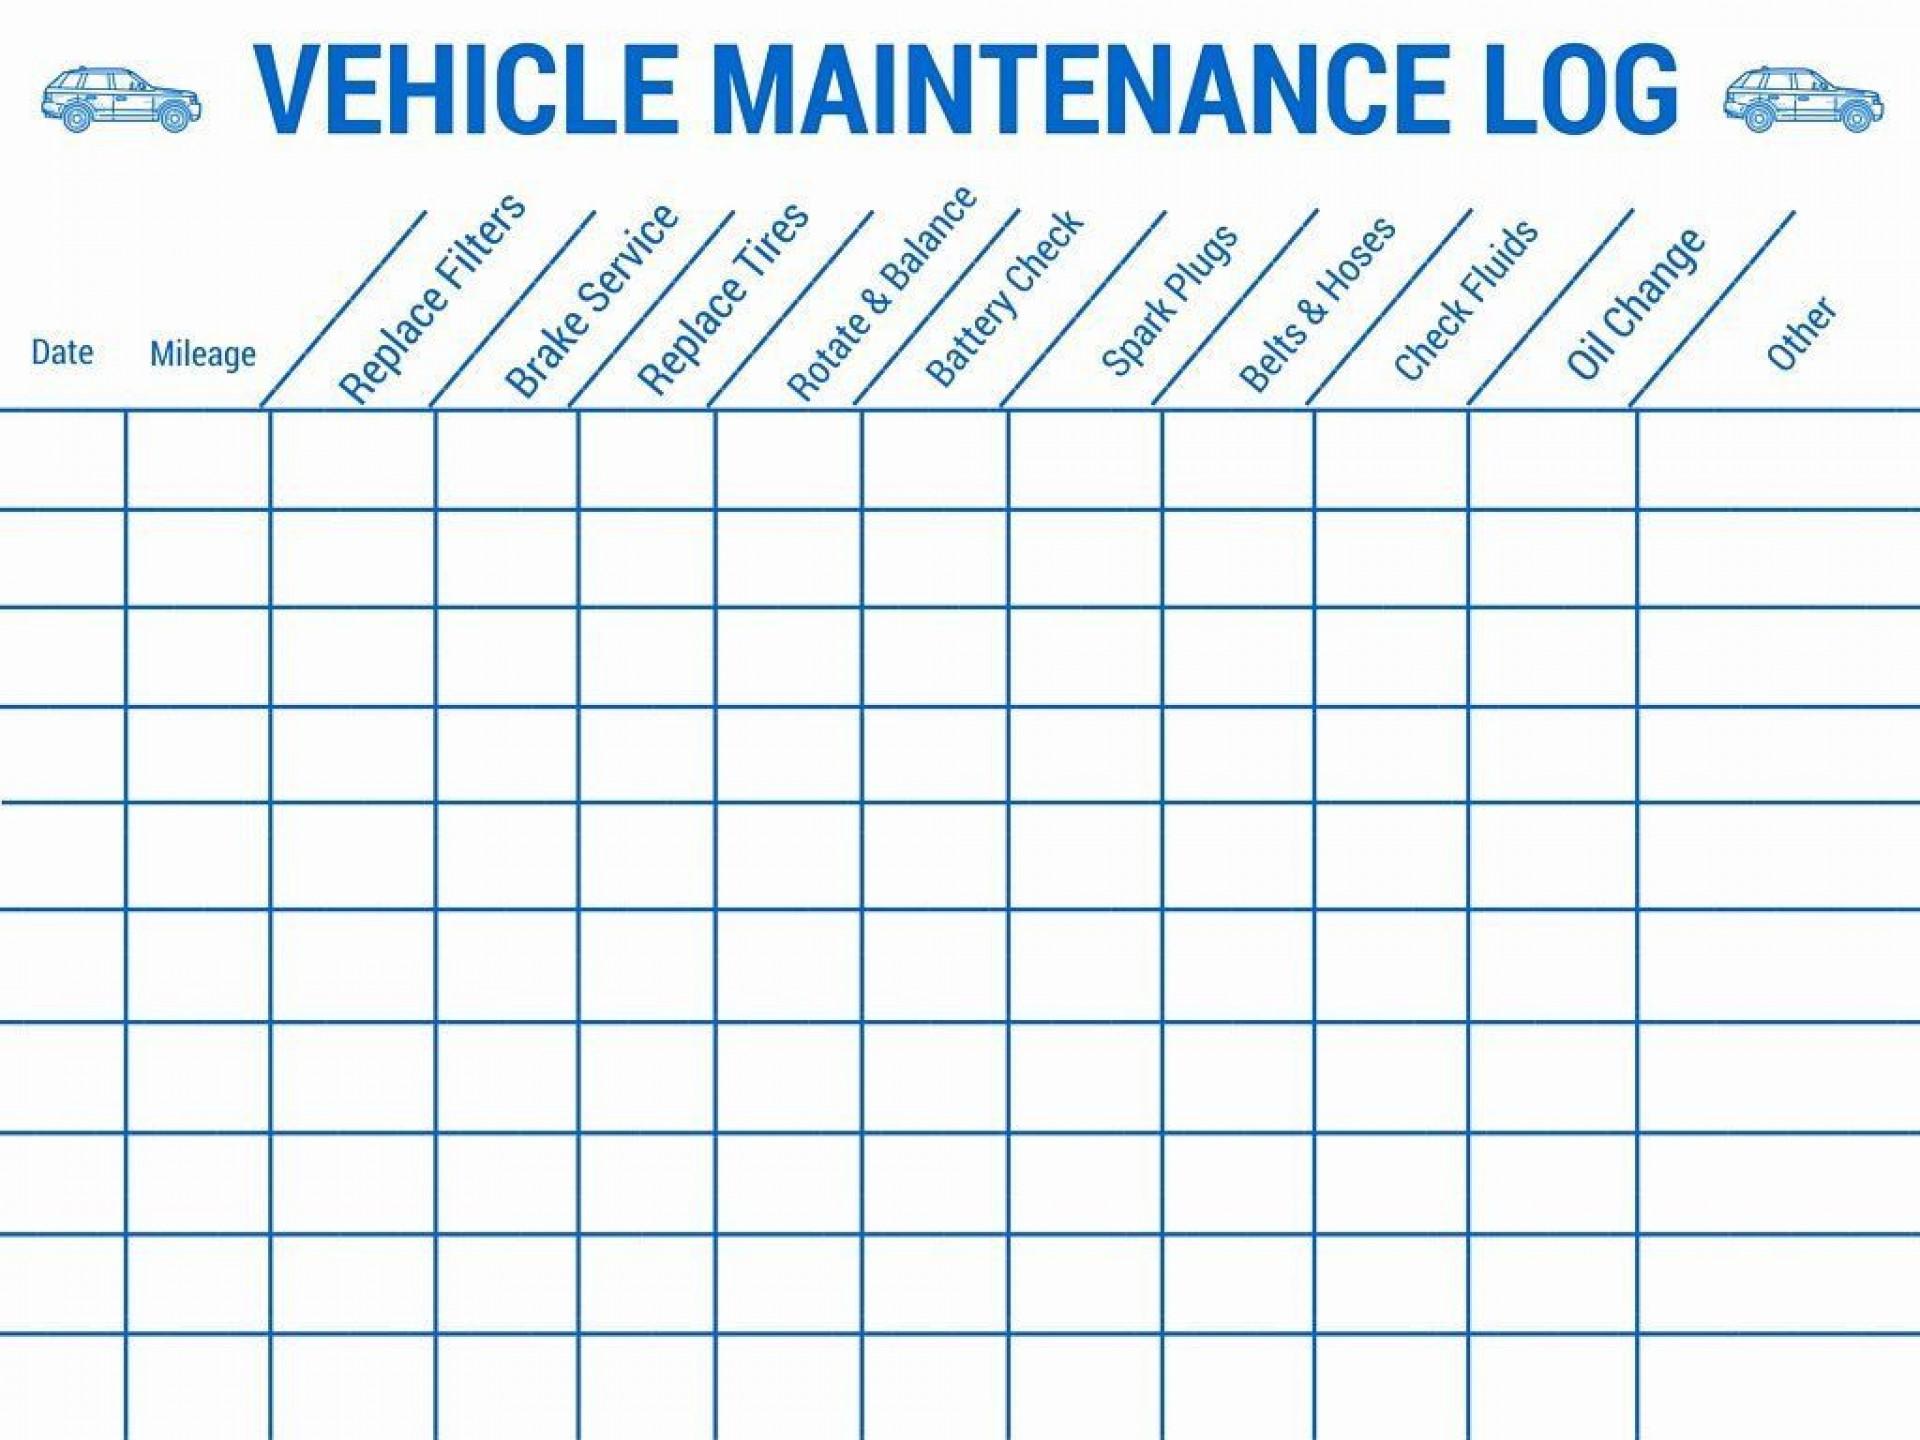 003 Imposing Car Maintenance Schedule Template Photo  Vehicle Preventive Excel Log1920